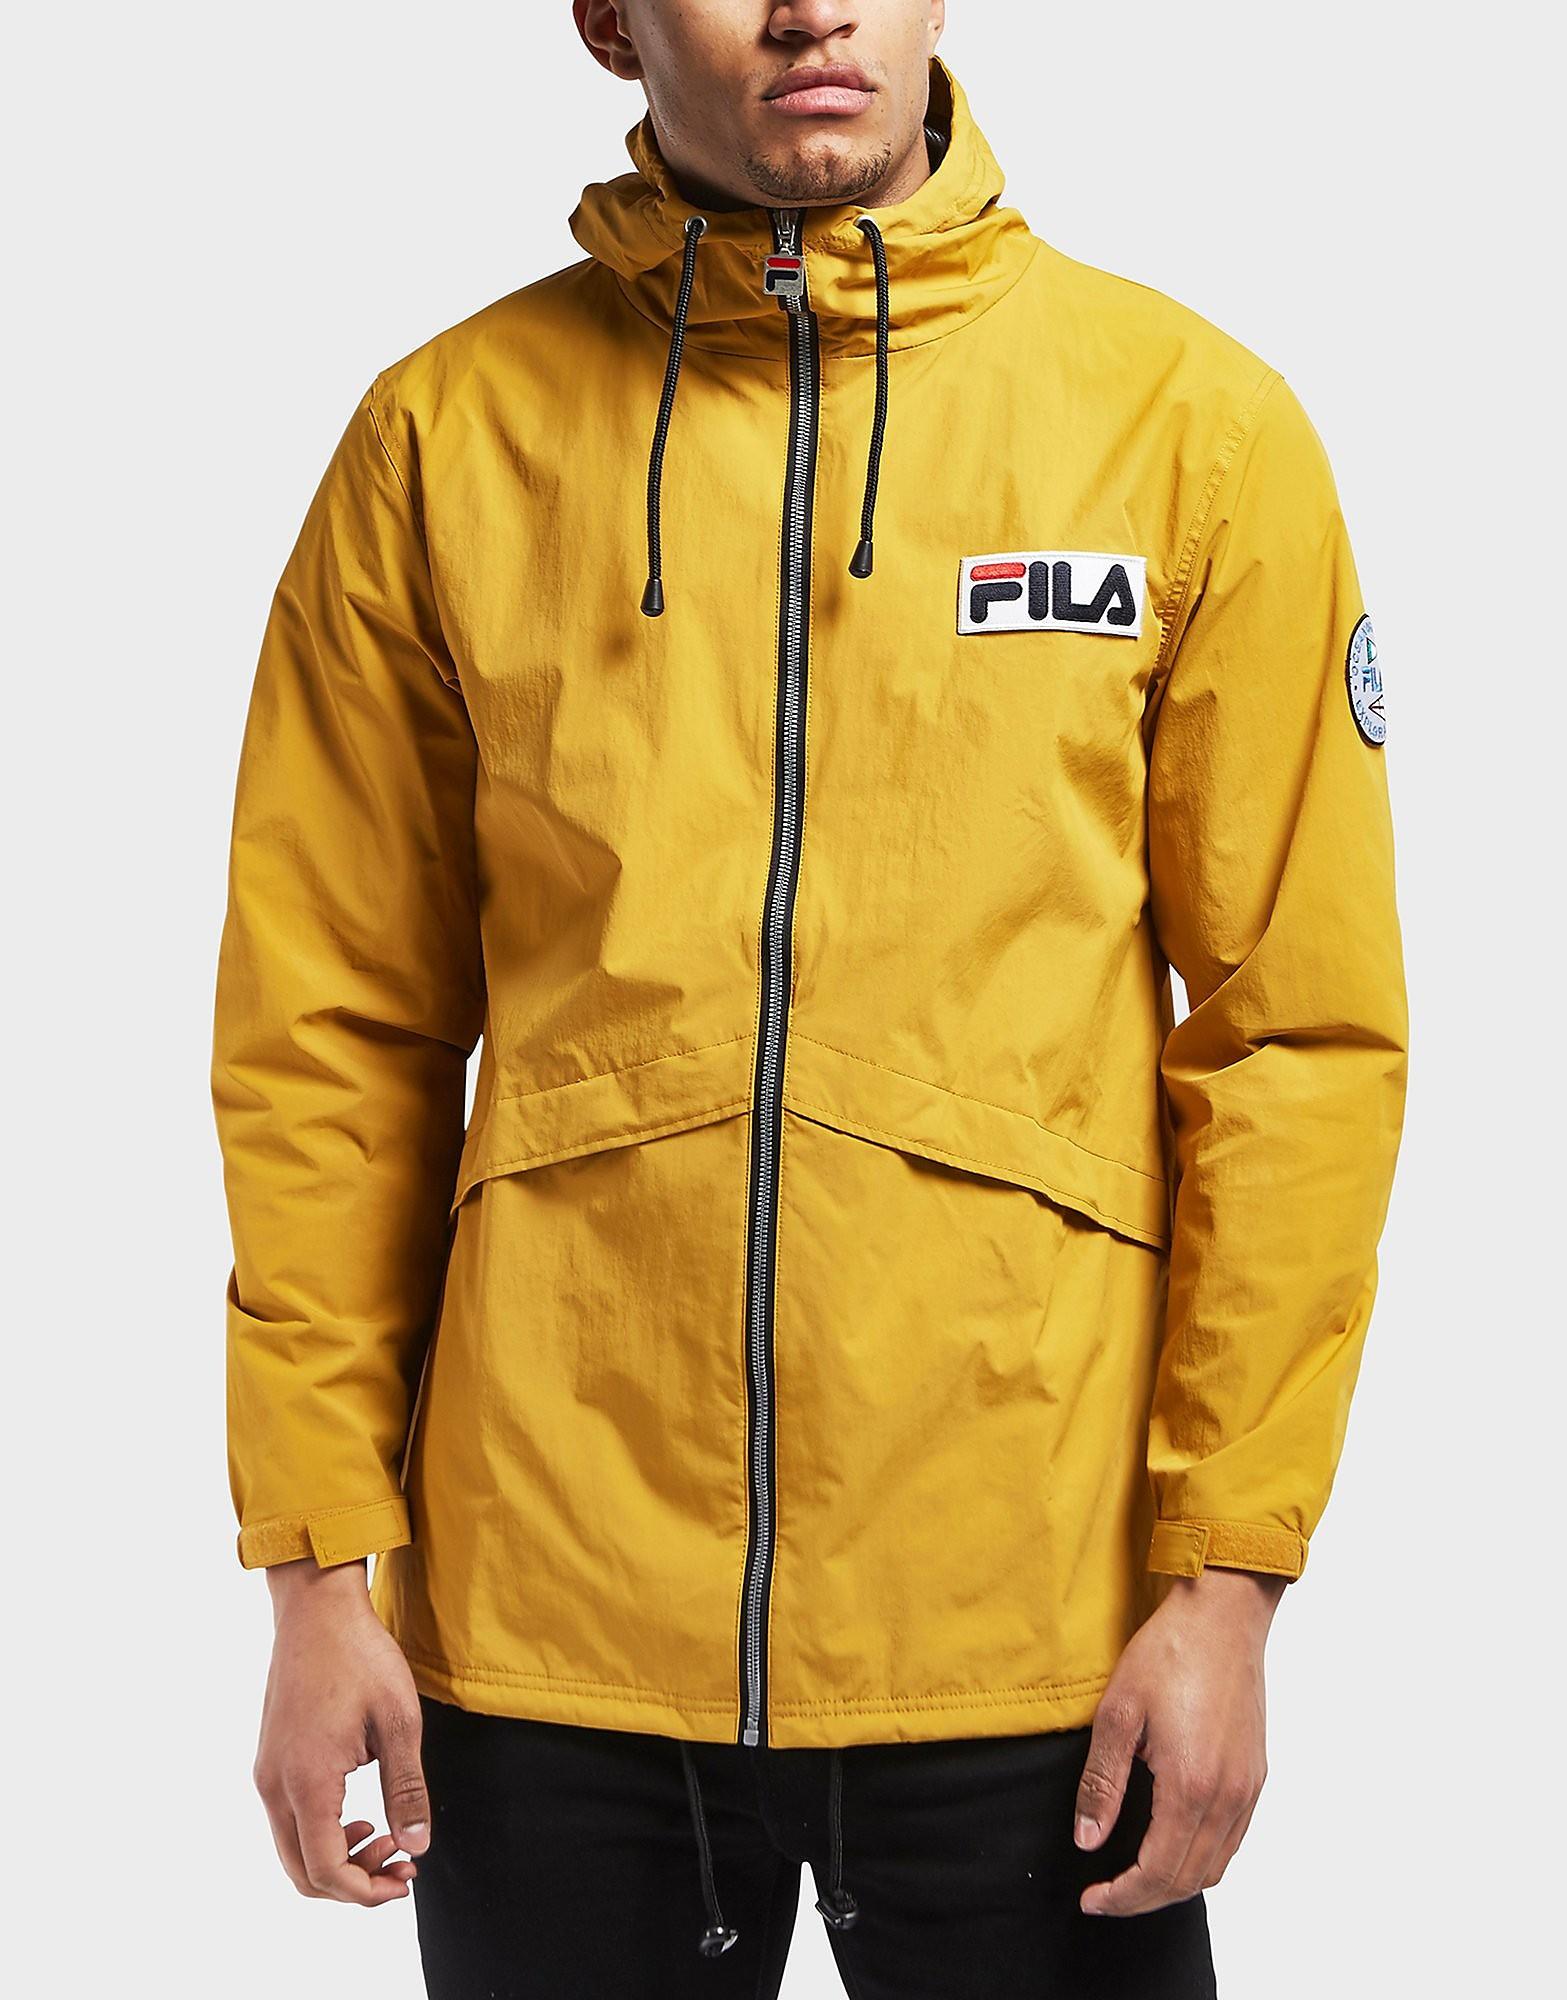 Fila Papillon Lightweight Jacket